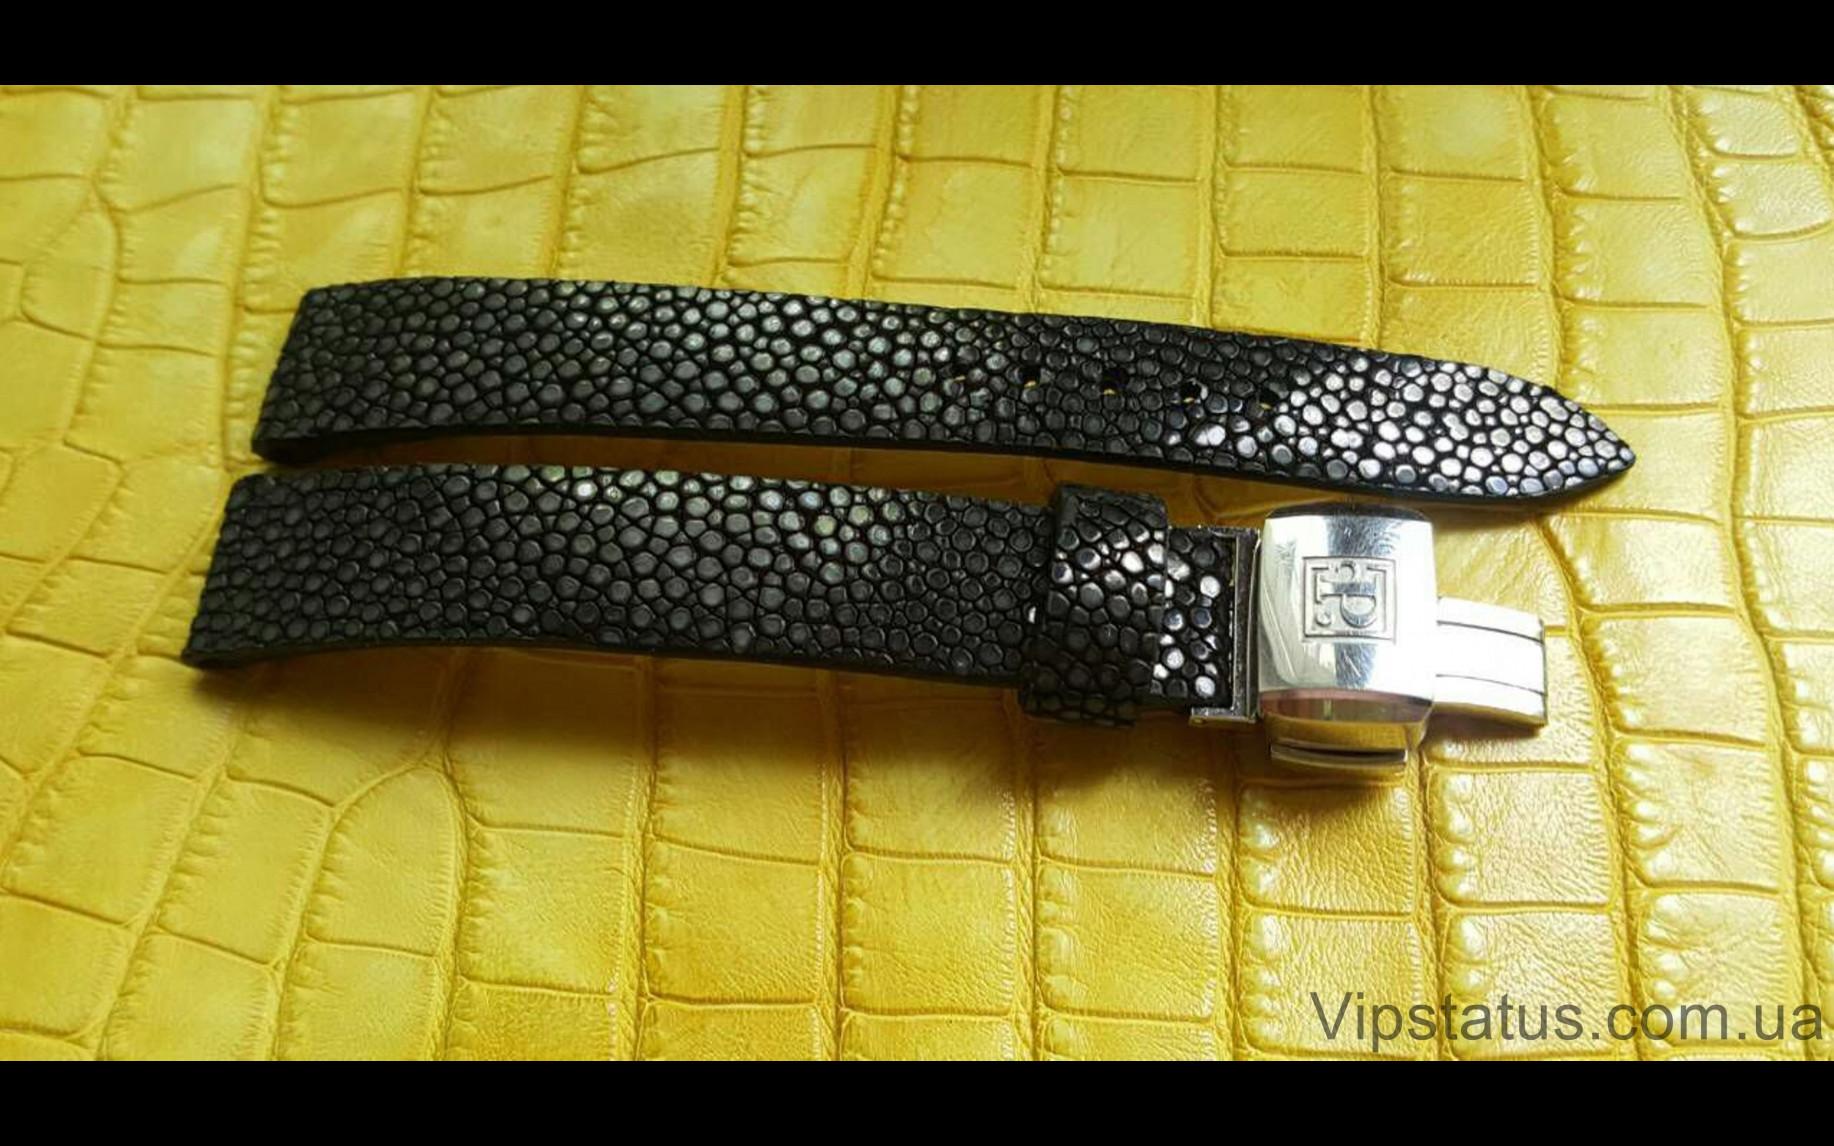 Elite Люксовый ремешок для часов Black Glitter кожа ската Black Glitter Luxury Stingray Leather Strap image 1